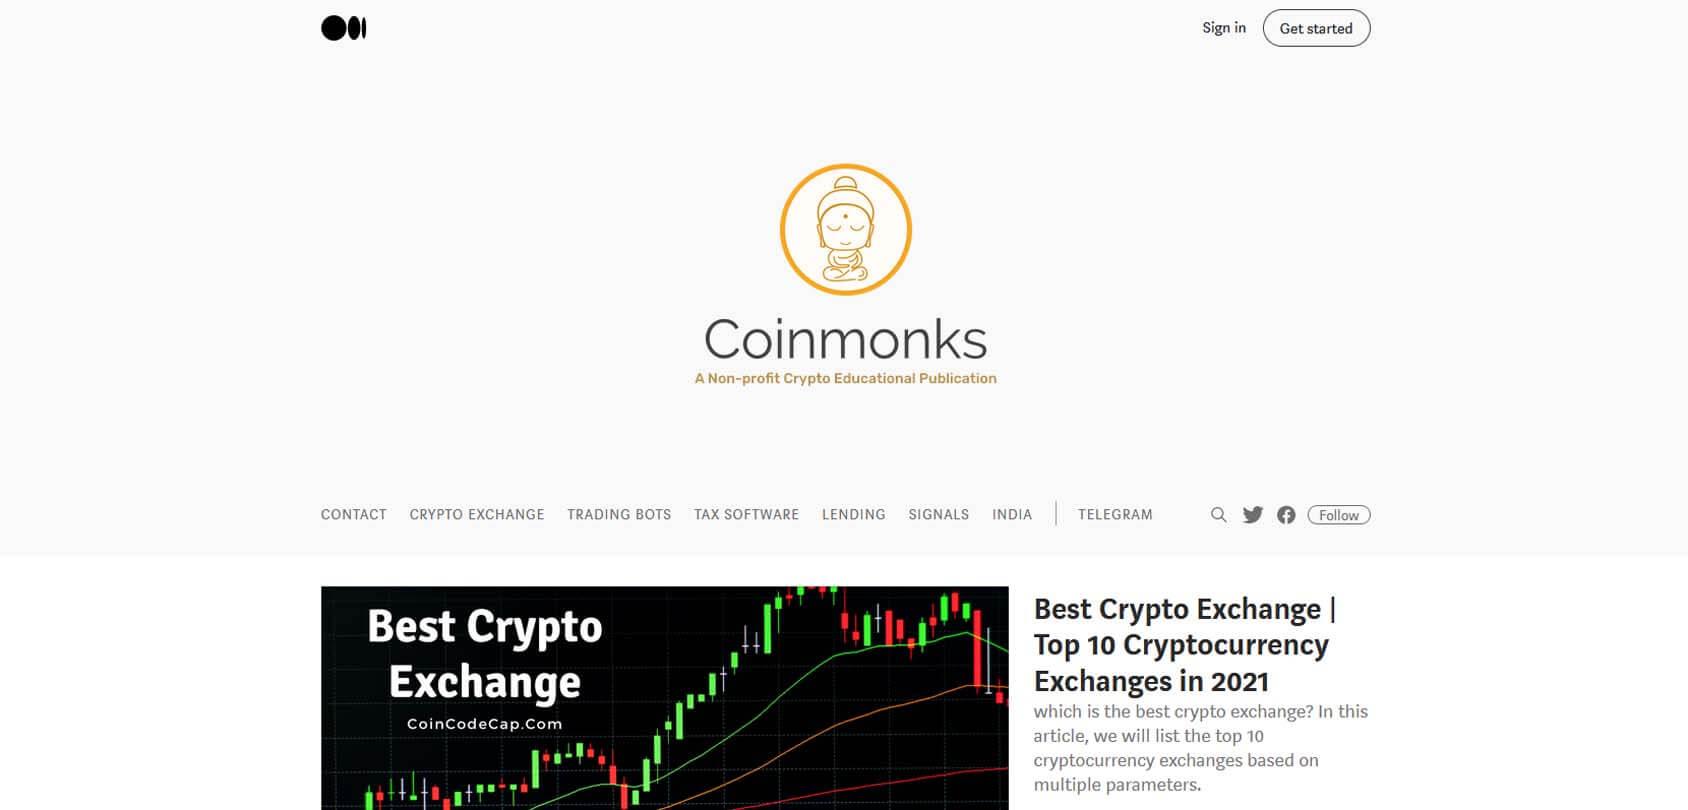 Coinmonks Homepage